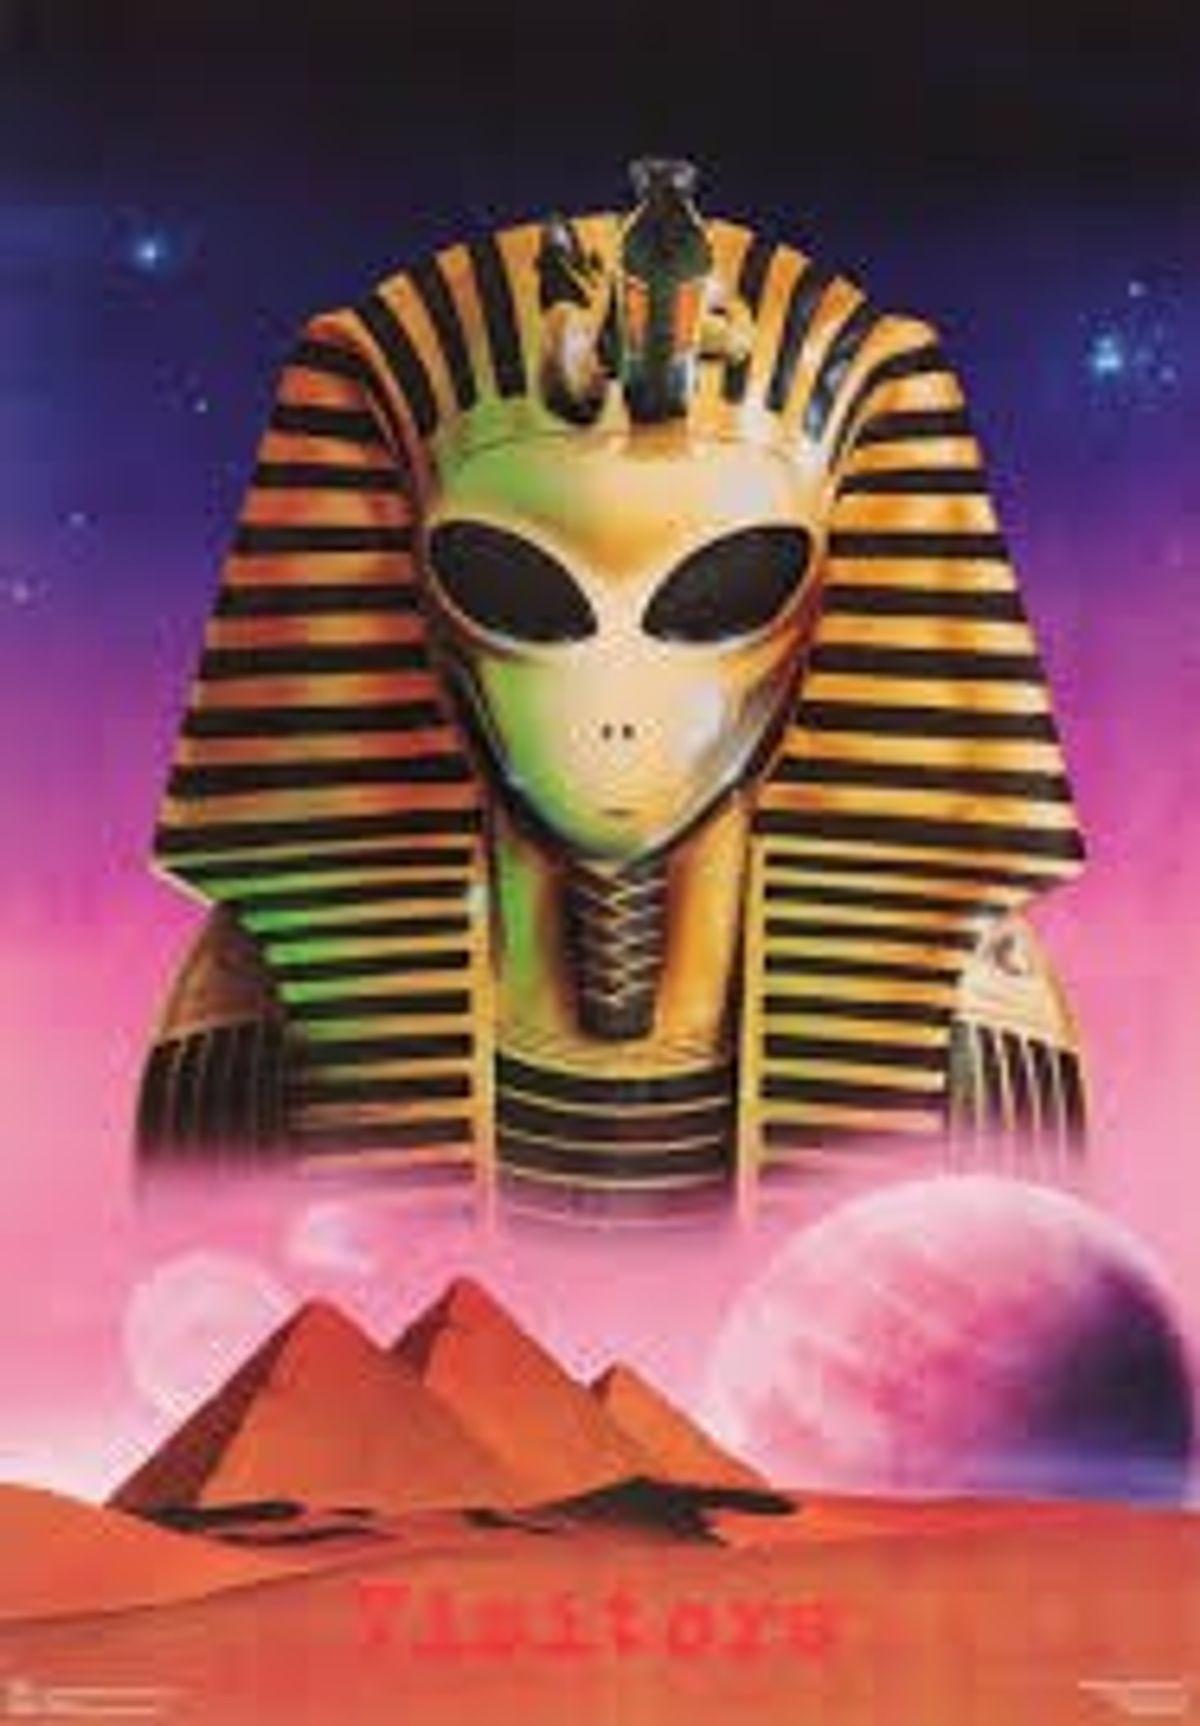 King Tut: Extraterrestrial